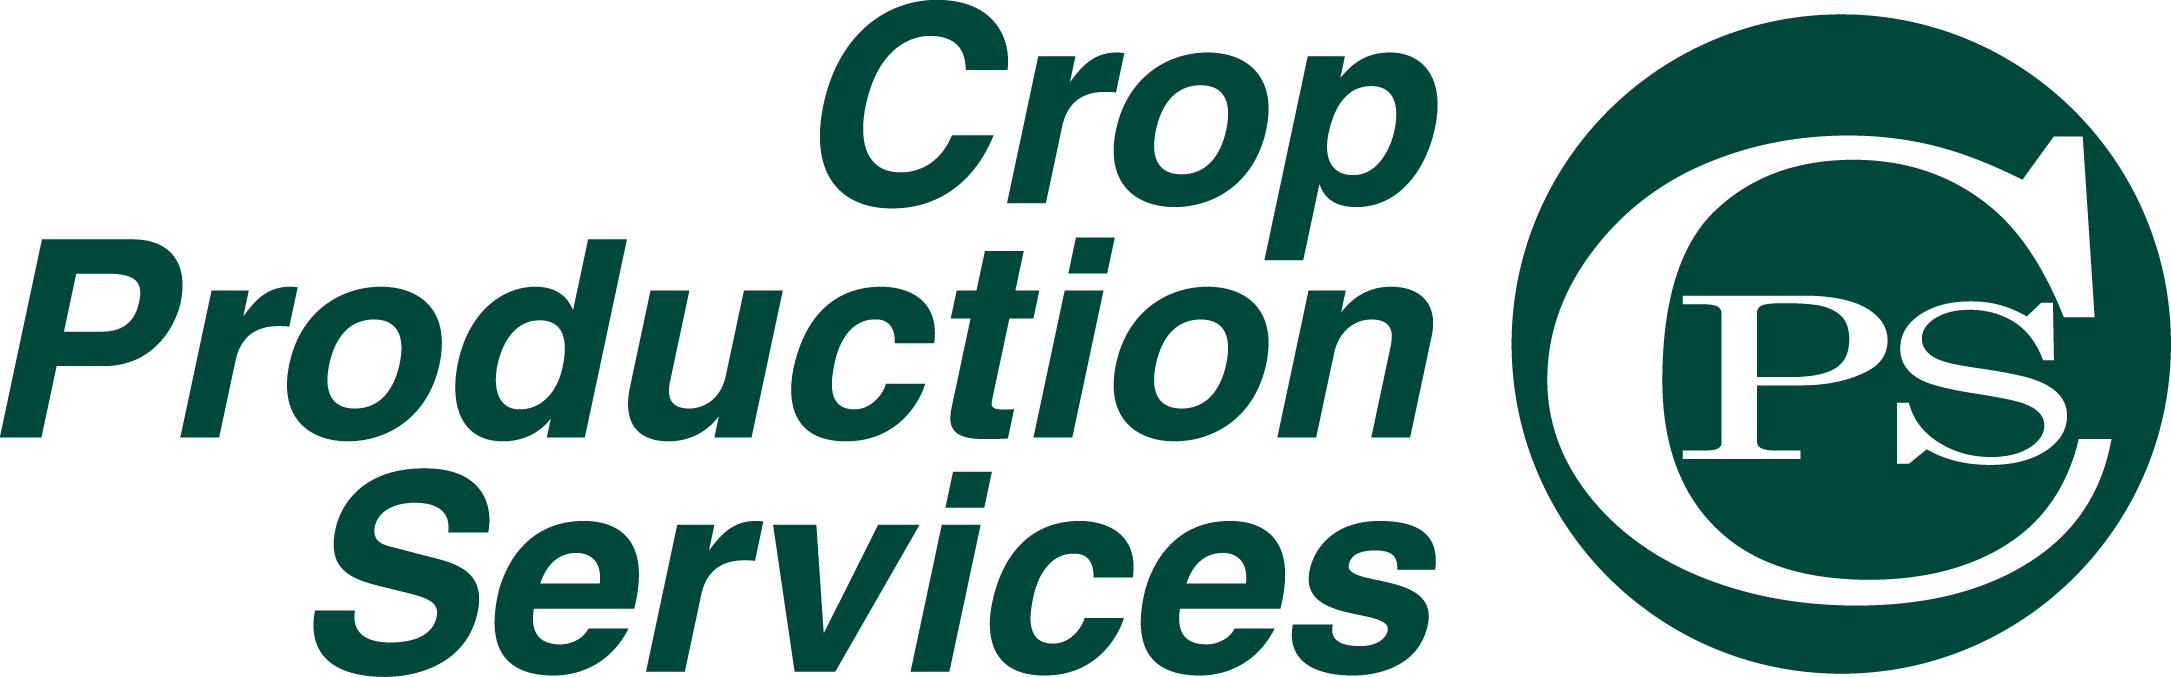 Crop-Production-Services.jpg